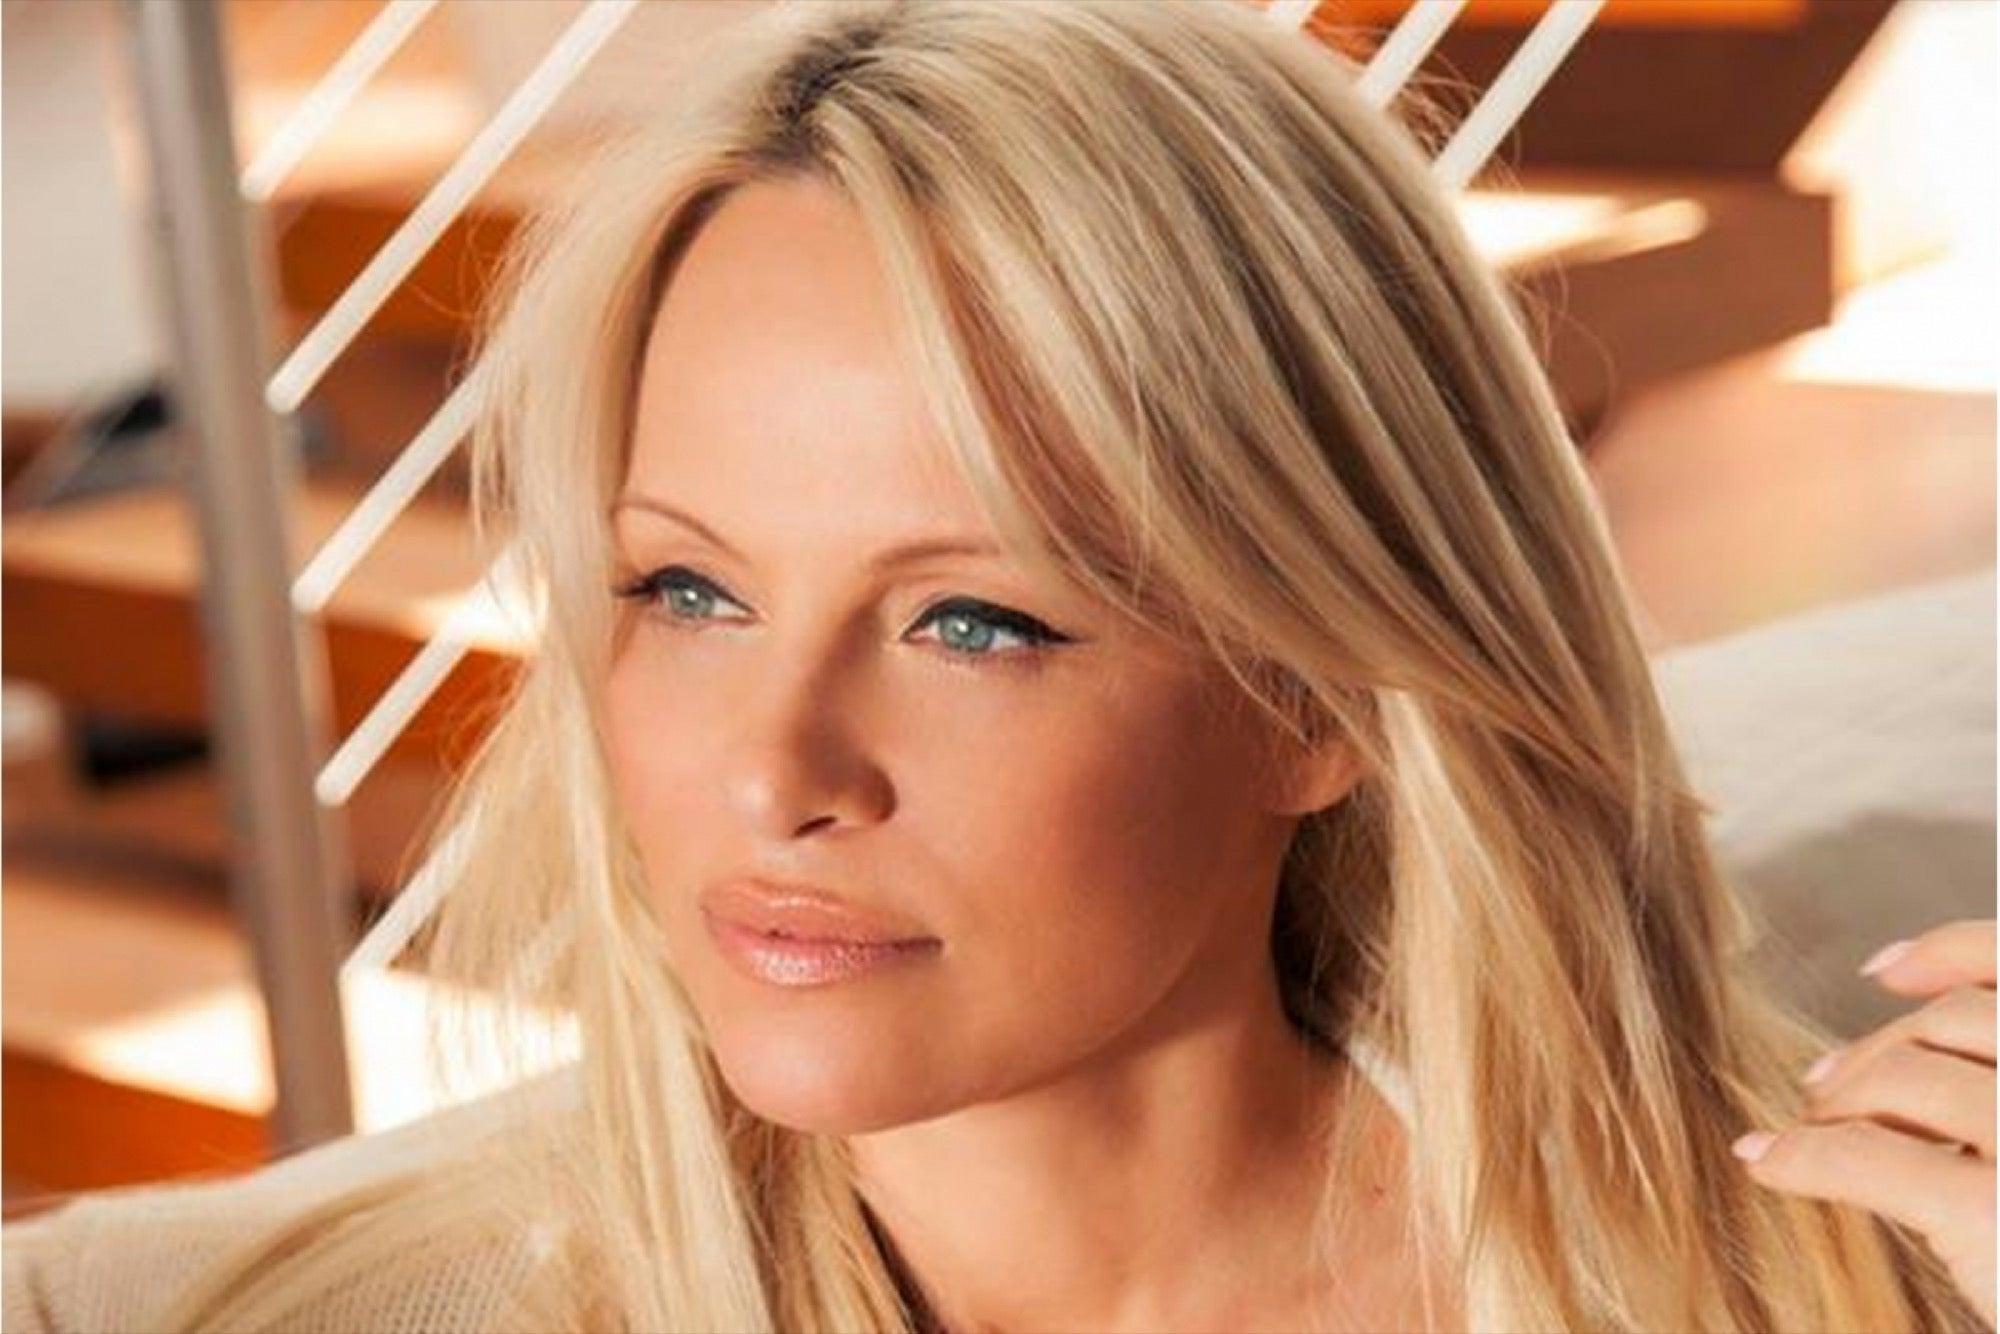 Playboys Last Nude Model Will Be Pamela Anderson